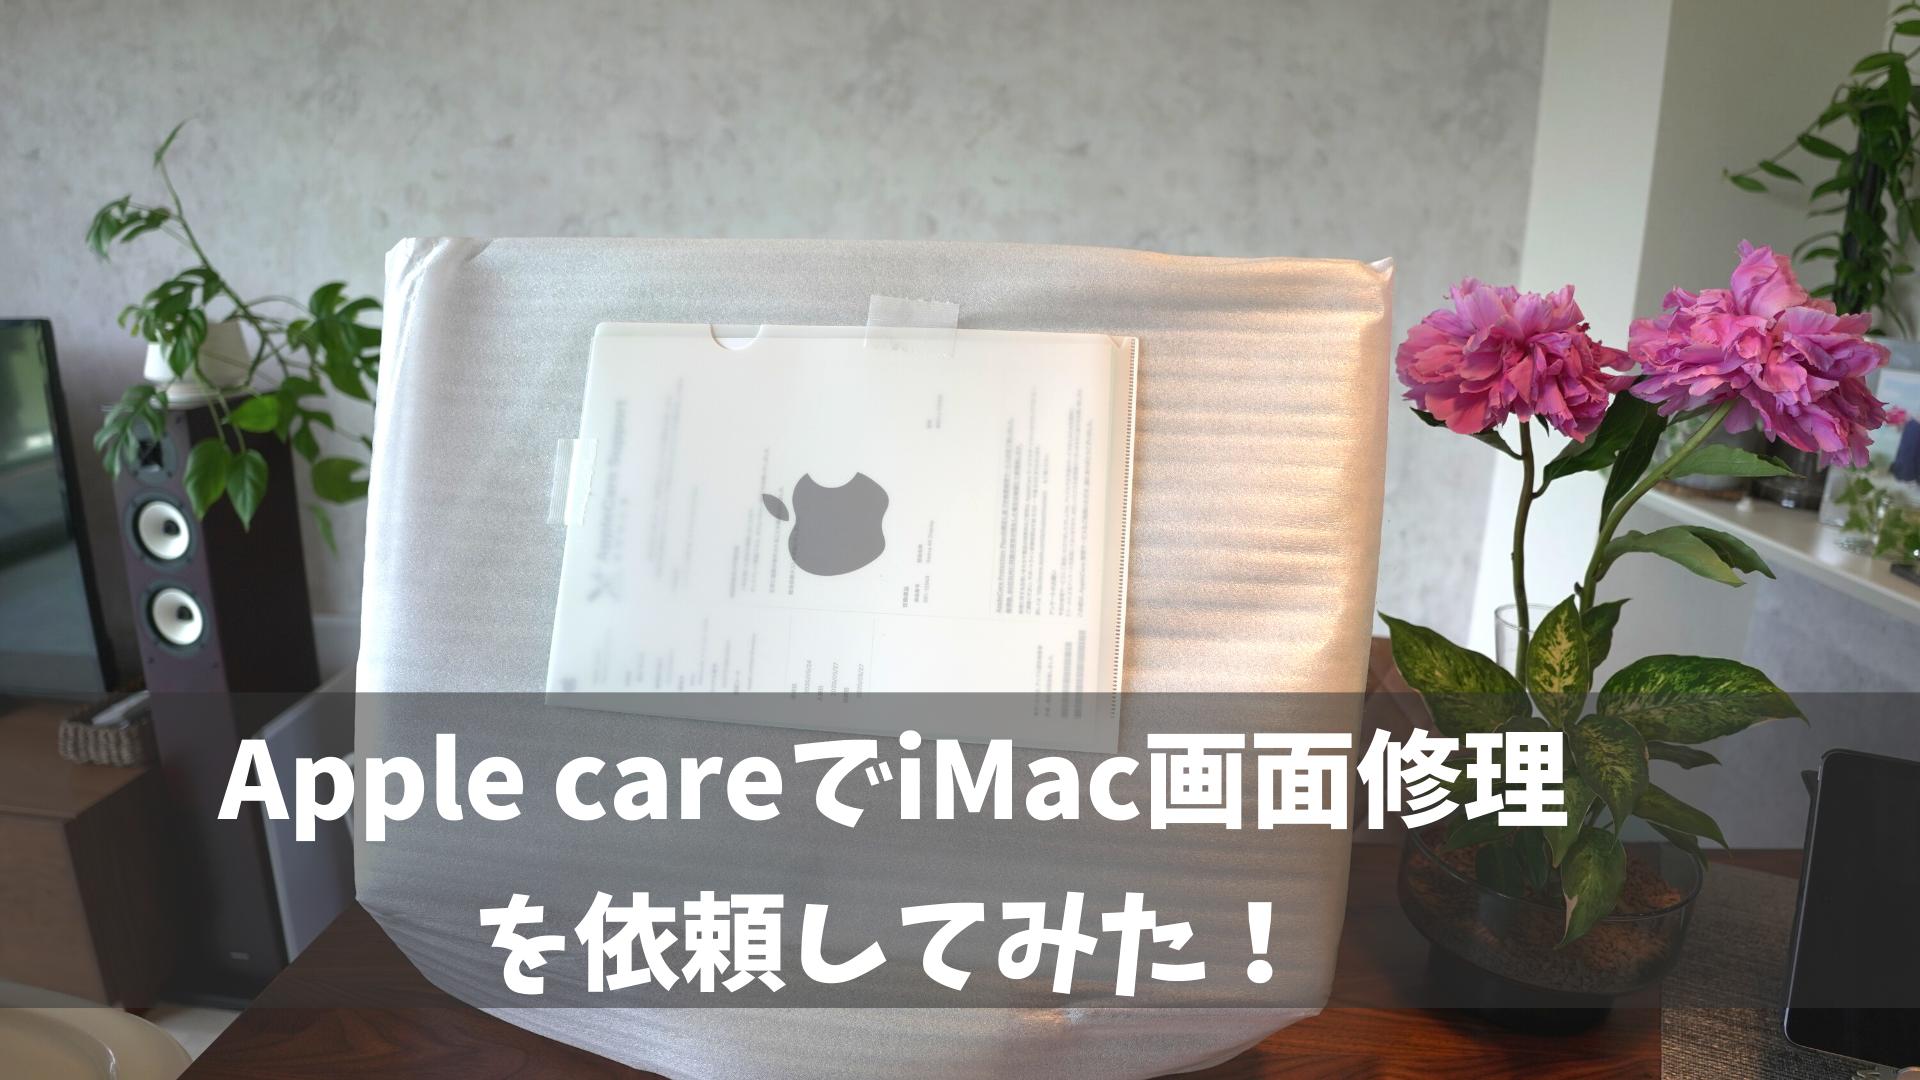 【apple care】iMacの画面修理に出してみた!